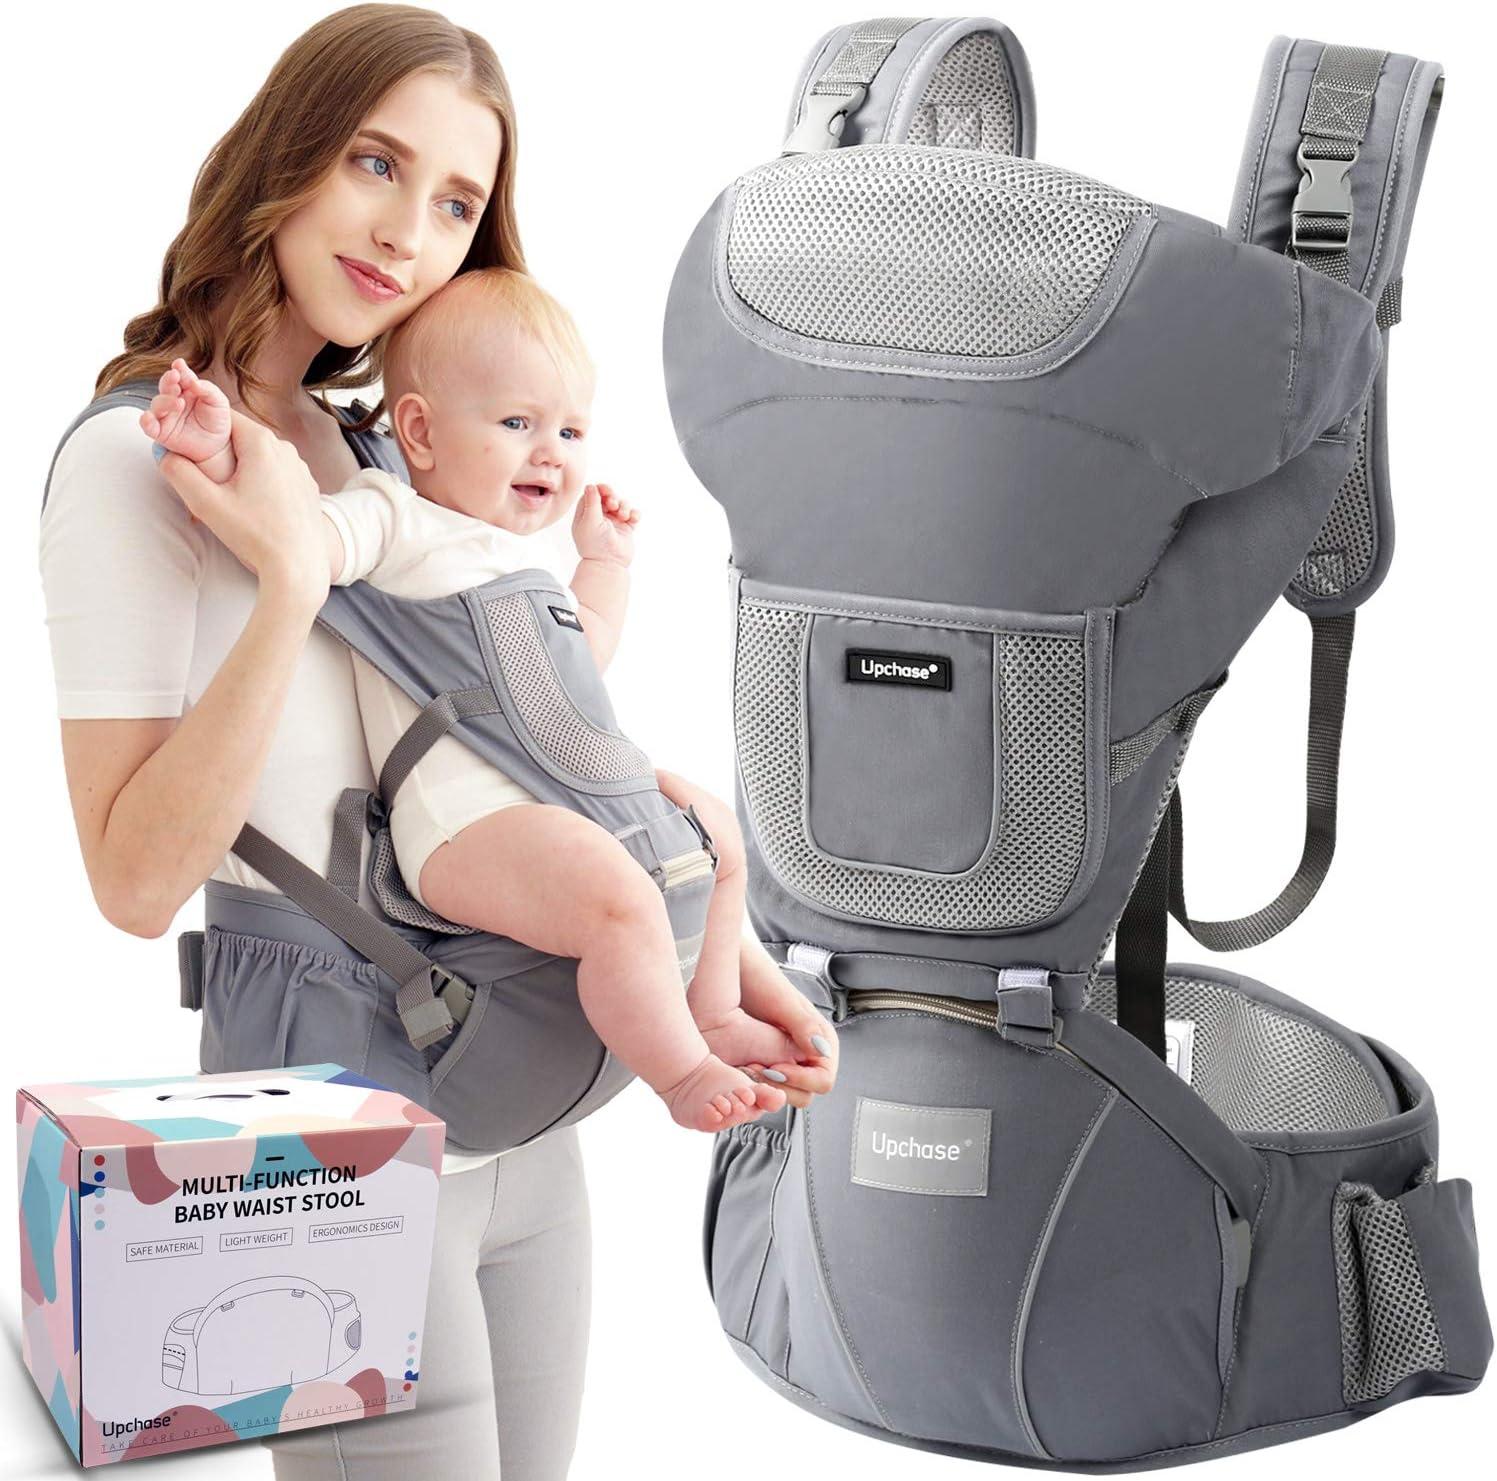 Upchase sac portage bébé